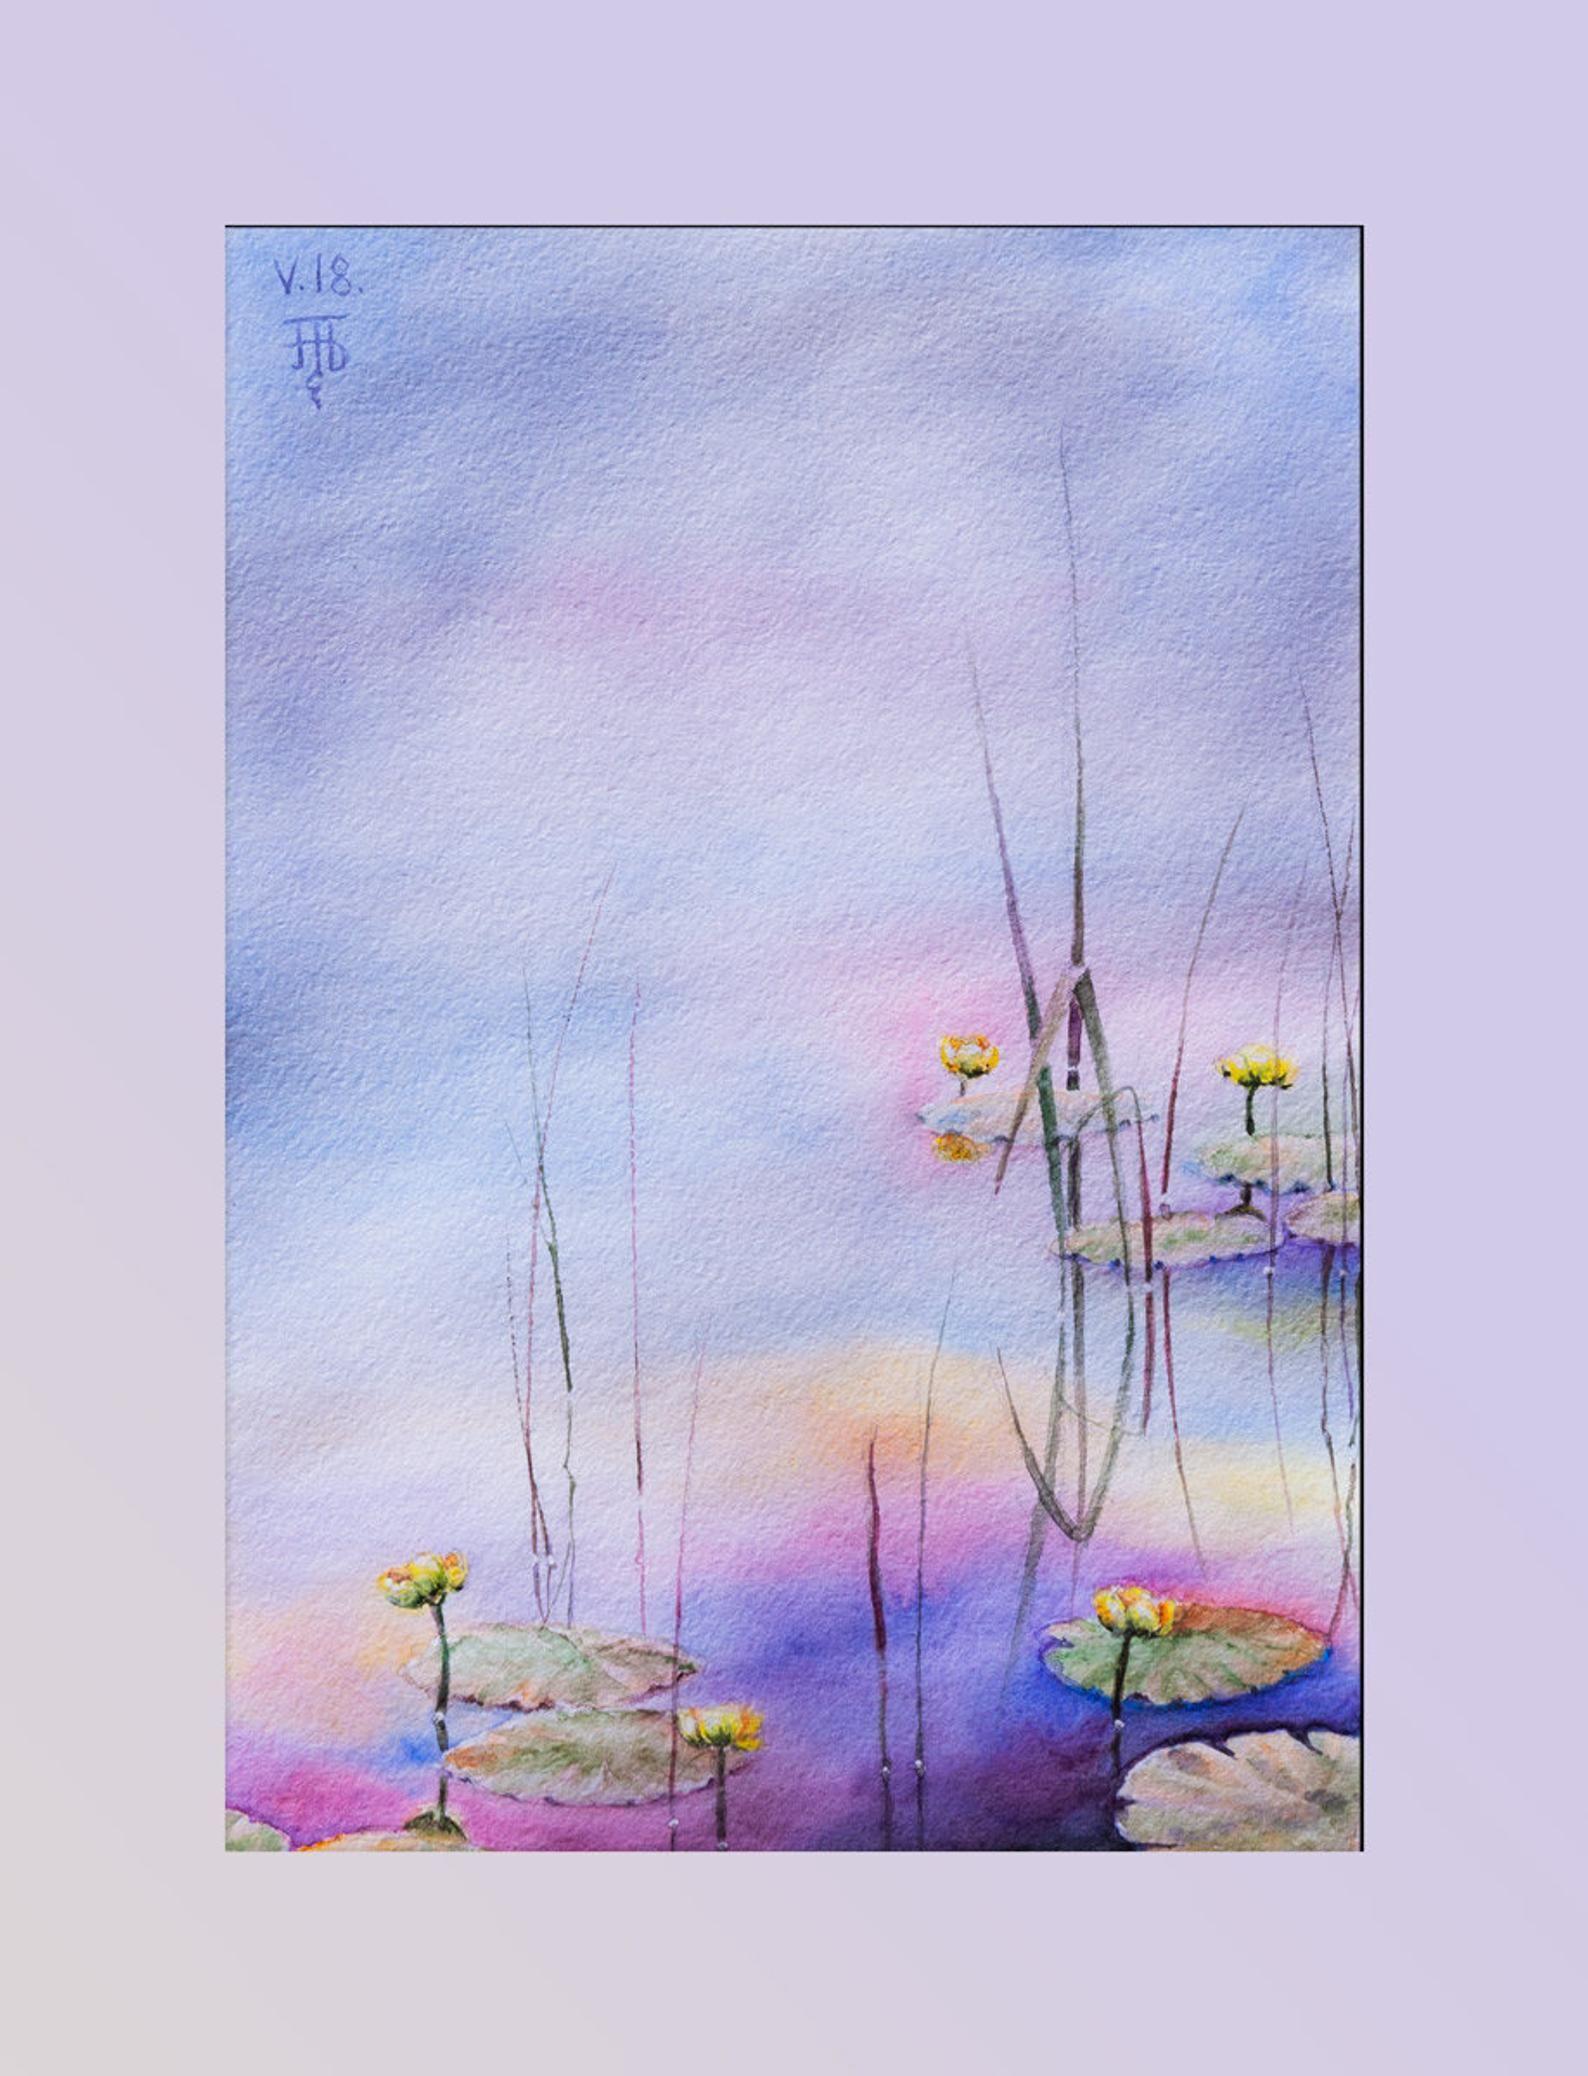 Seerosen Original Aquarell Malerei Wand Kunst Blumen Etsy In